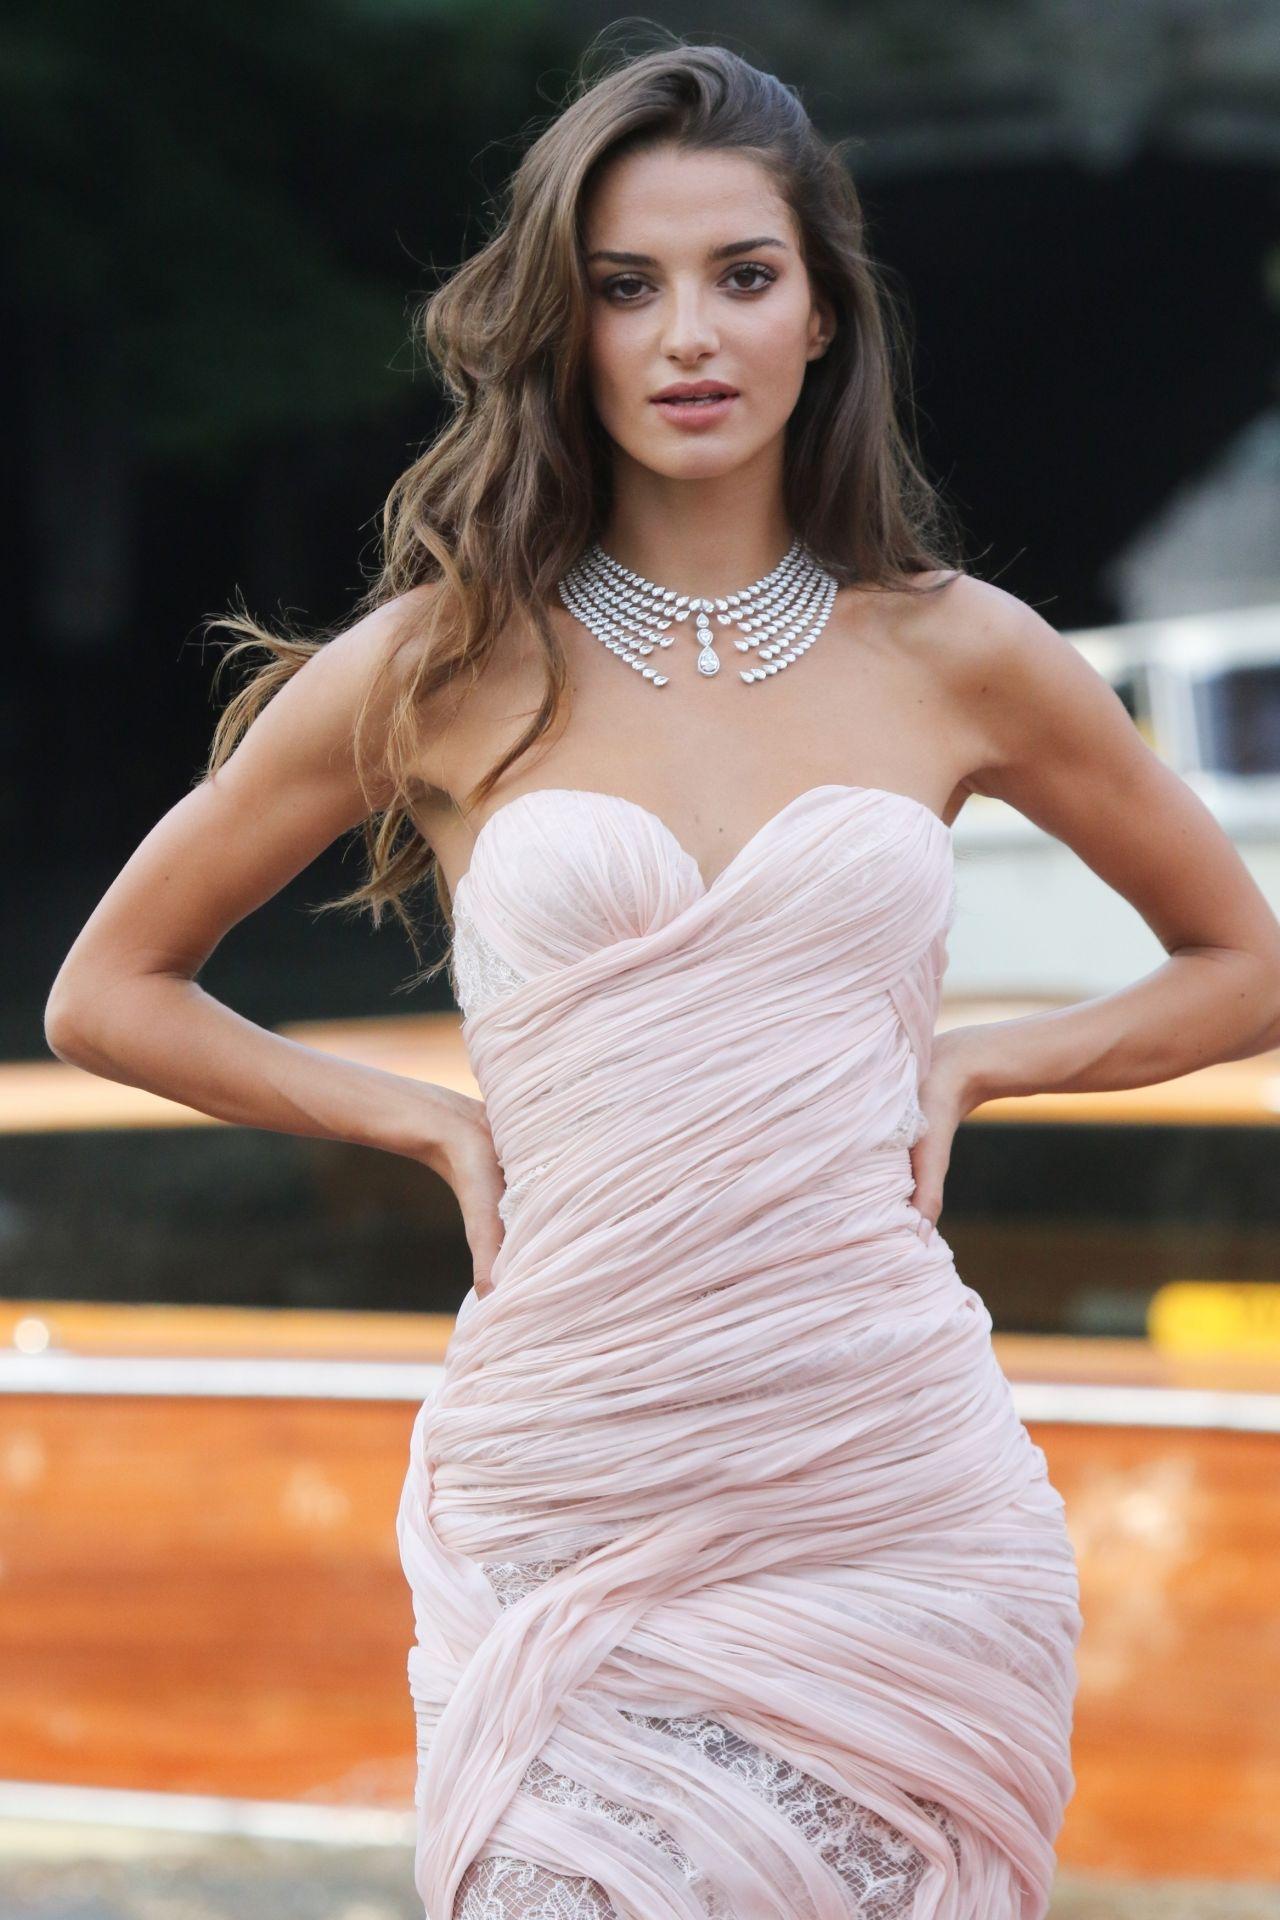 Leaked Gabrielle Caunesil nudes (34 foto and video), Sexy, Paparazzi, Boobs, bra 2019